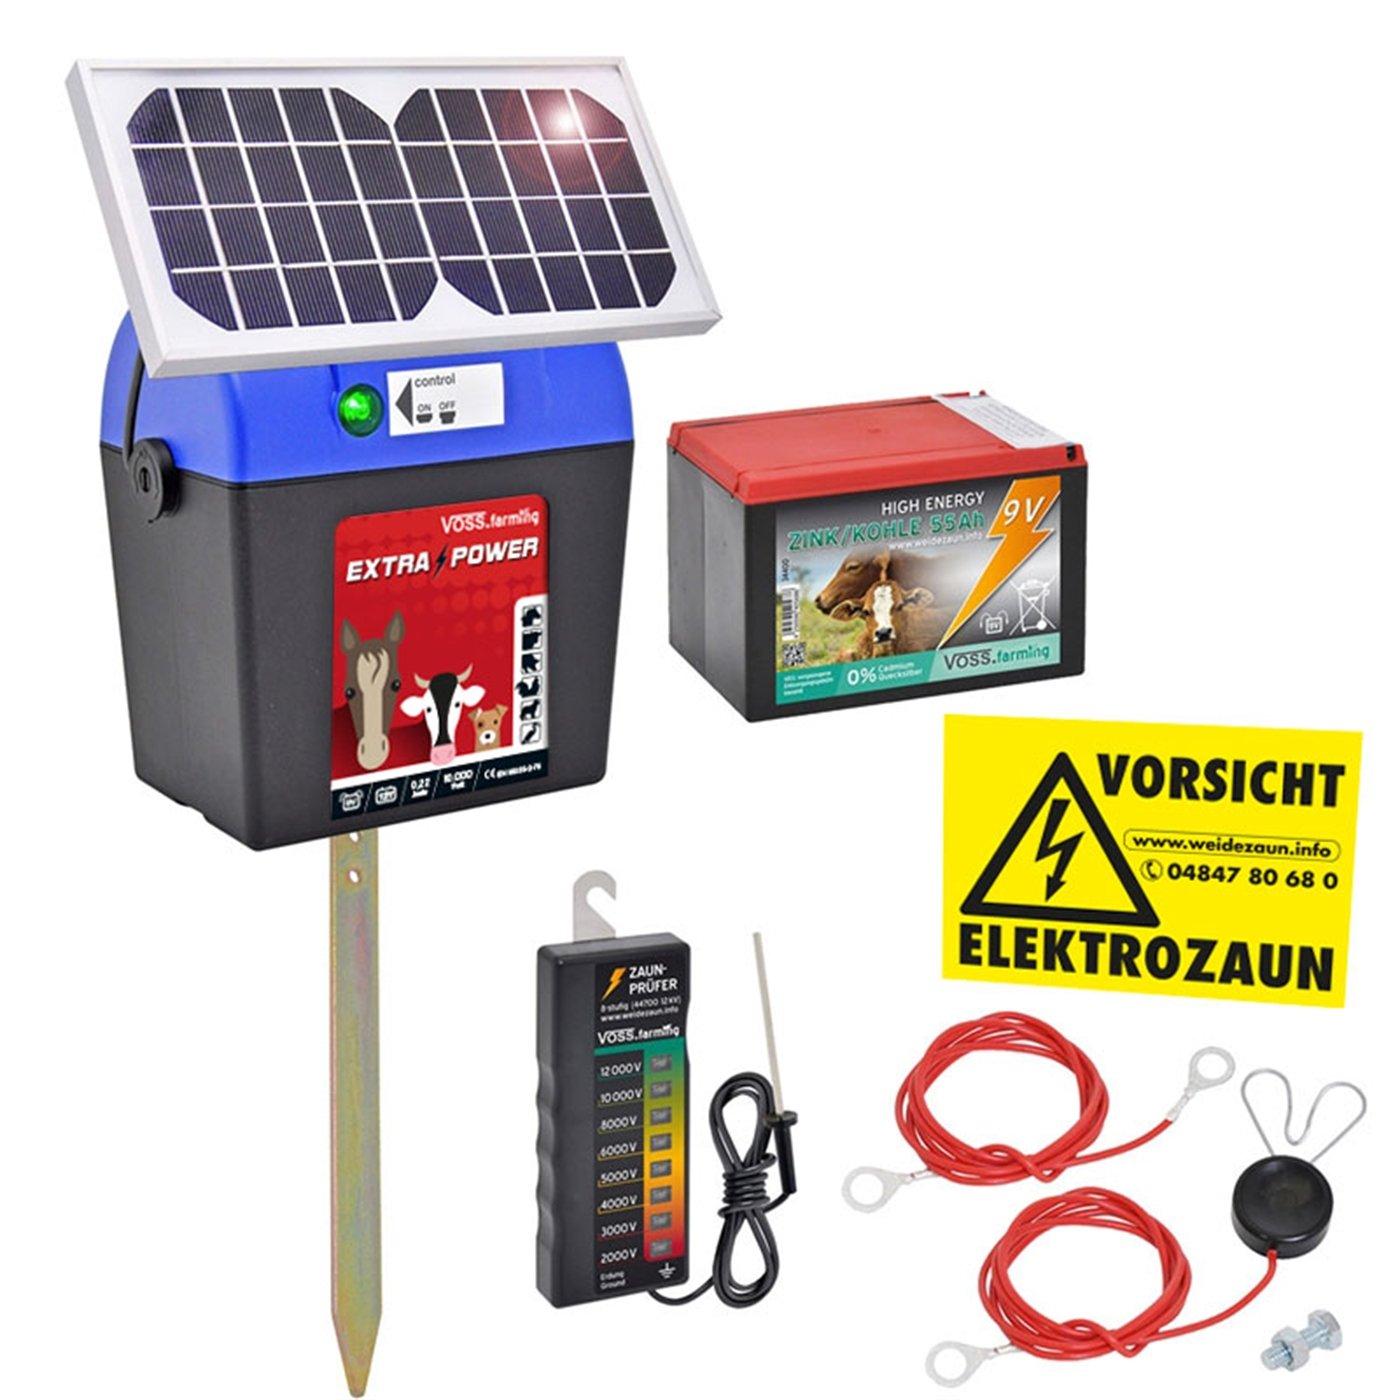 VOSS.farming Weidezaungerät 9V inkl. Batterie, Solar, Zubehör ...